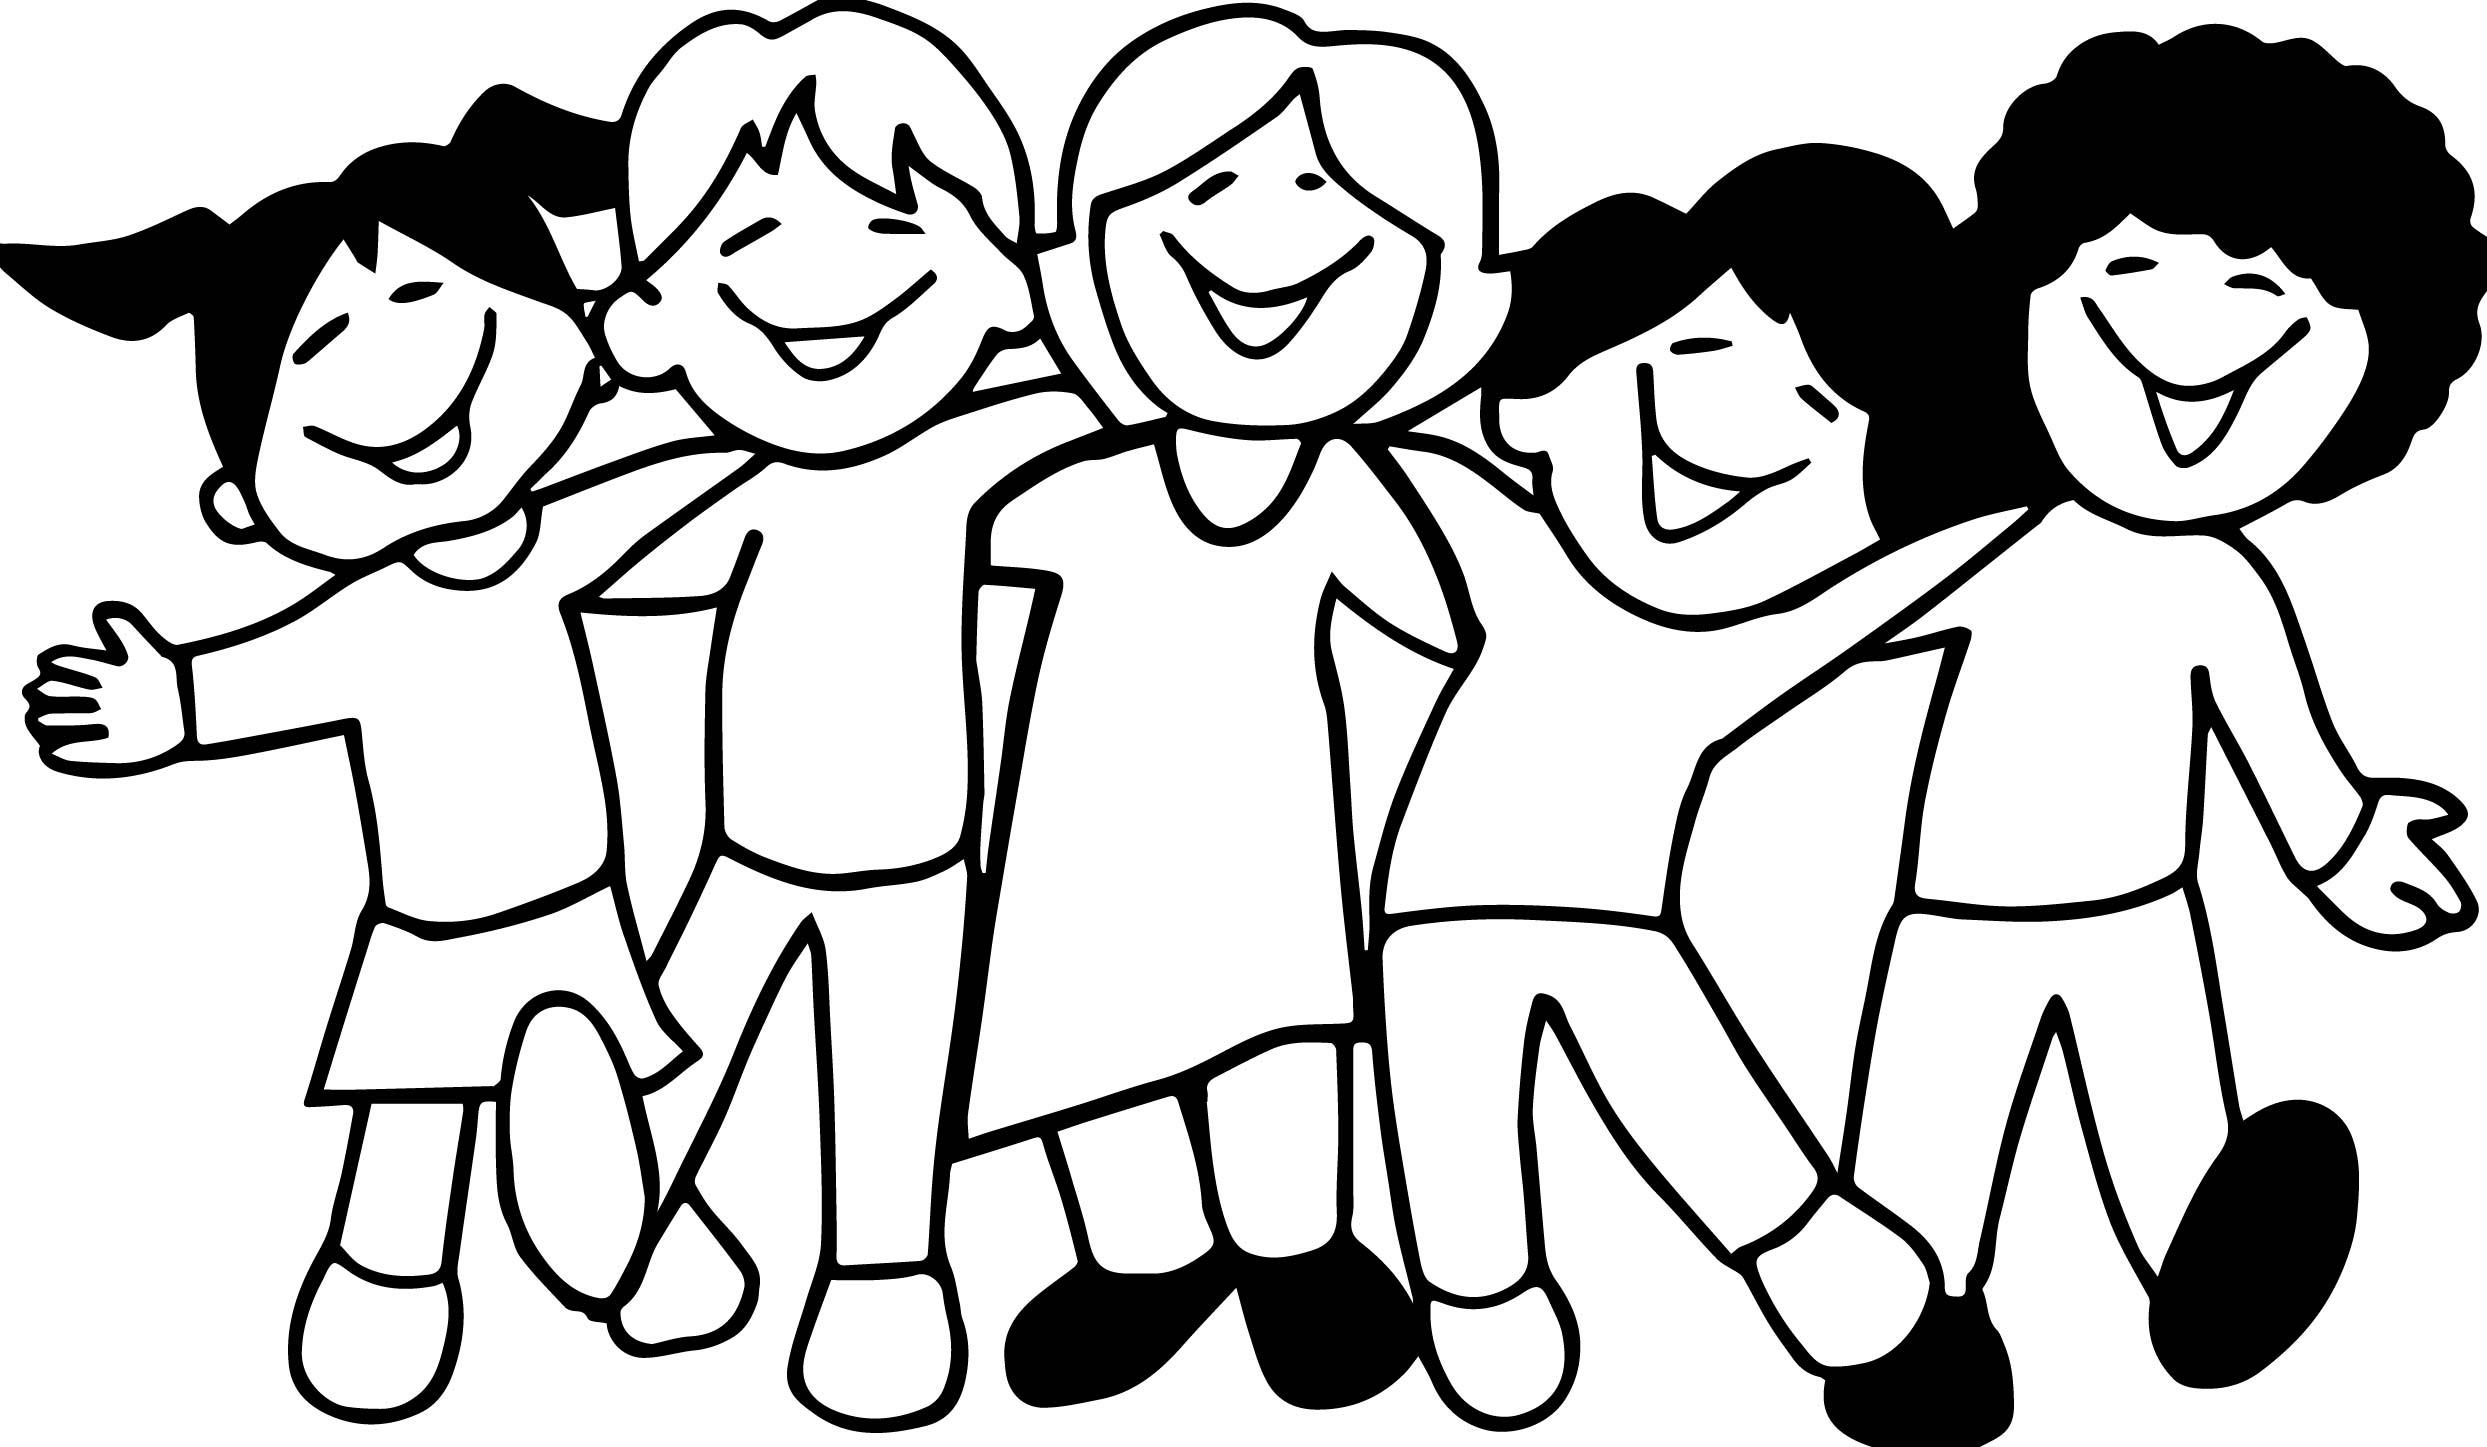 Five Kids Friendship Coloring Page | Wecoloringpage.com